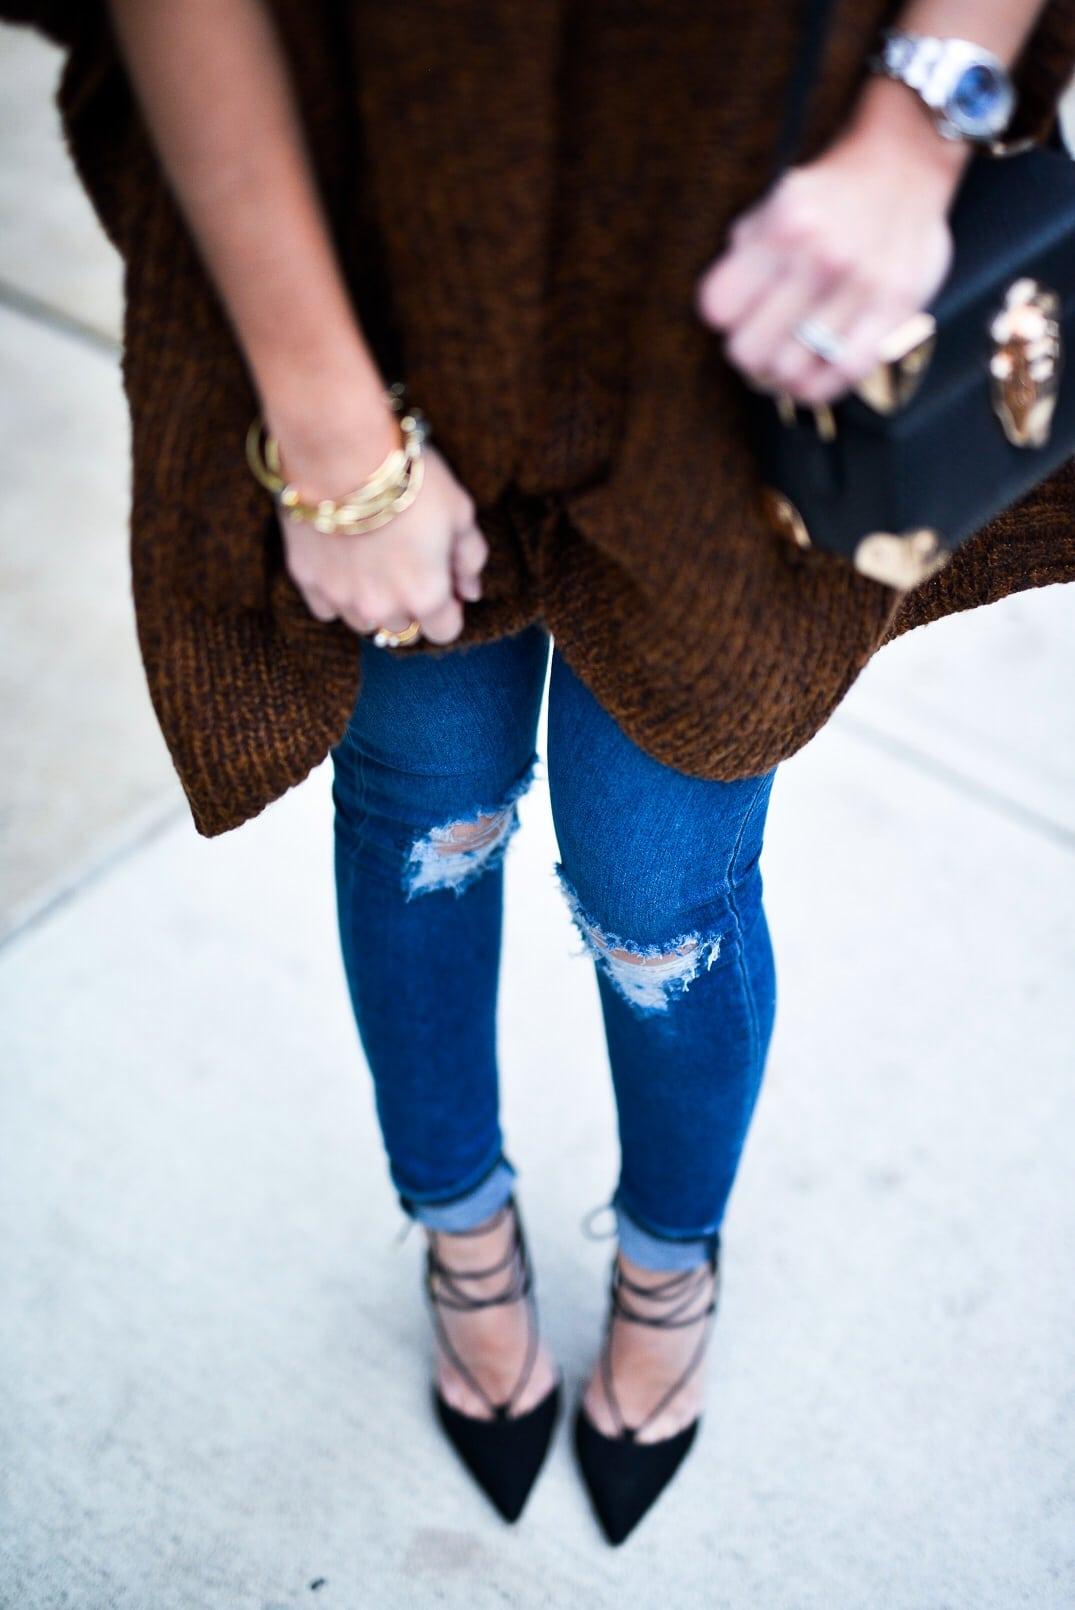 Pam Hetlinger wearing Asos Poncho, Asos Jeans, Lace-up heels